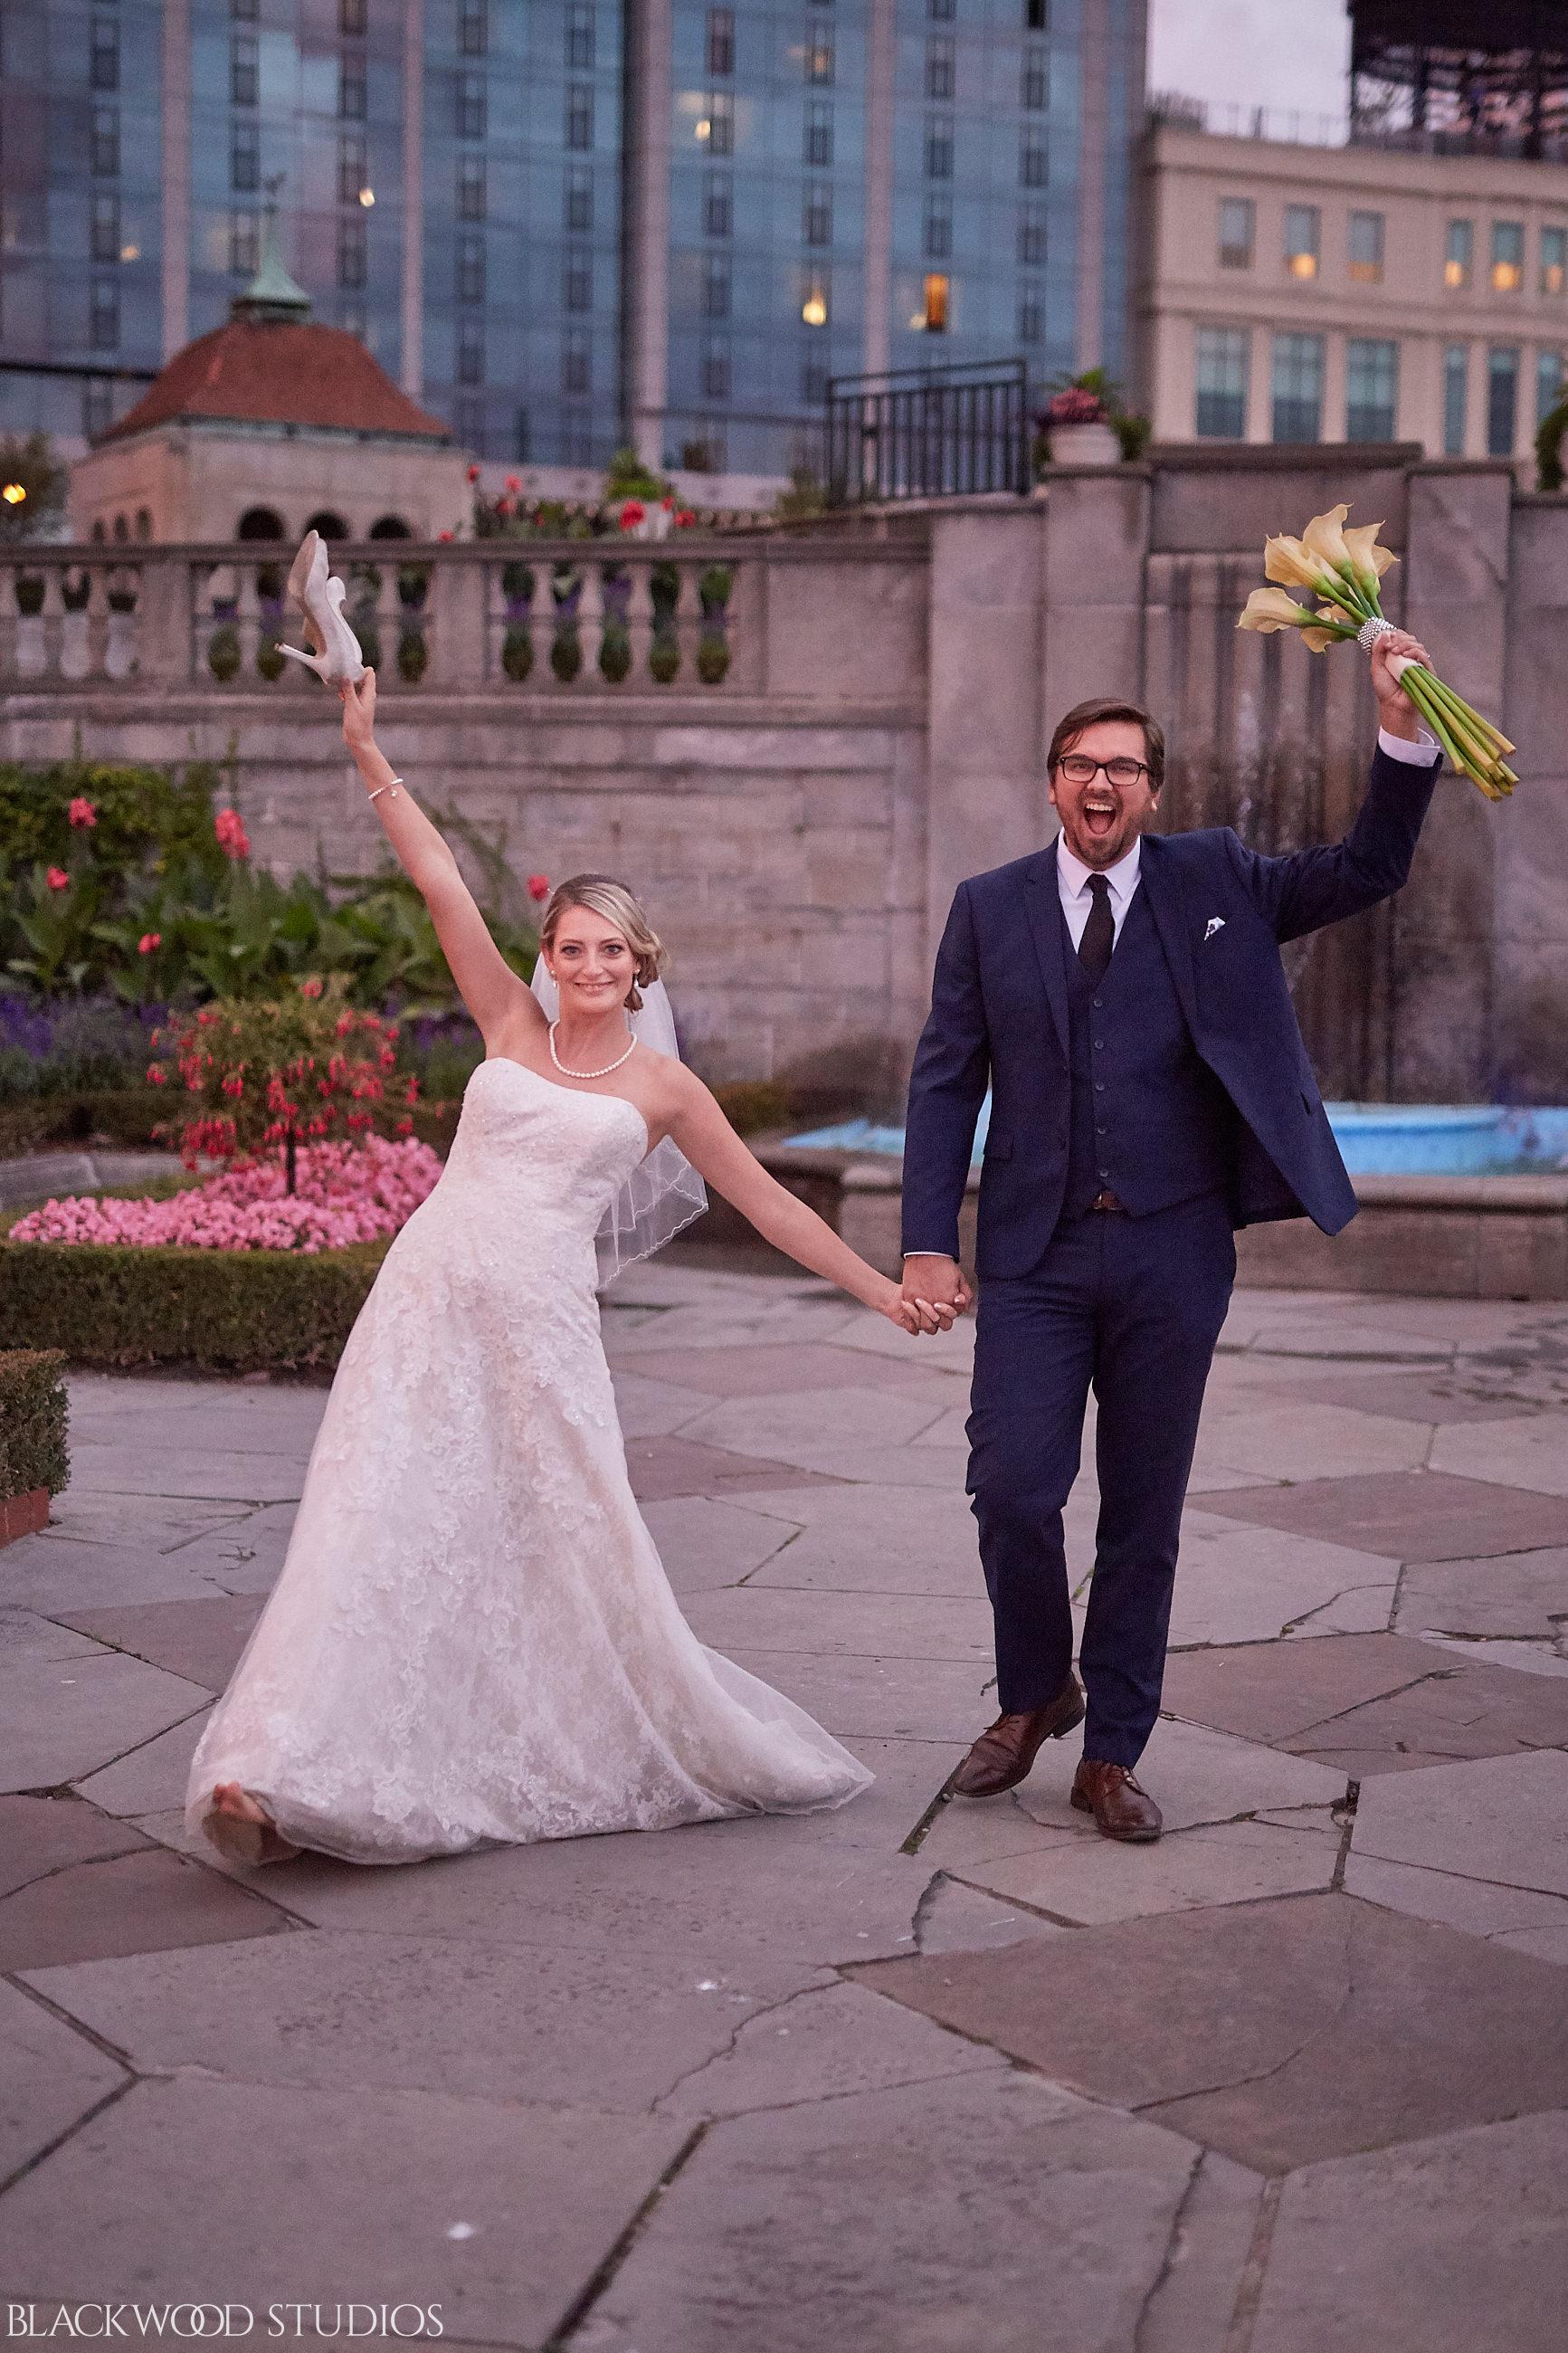 Blackwood-Studios-Wedding-Photography-20170928-190519-Marek-Katie-Michalek-Oakes-Garden-Theatre-Niagara-Falls-Ontario-Canada.jpg